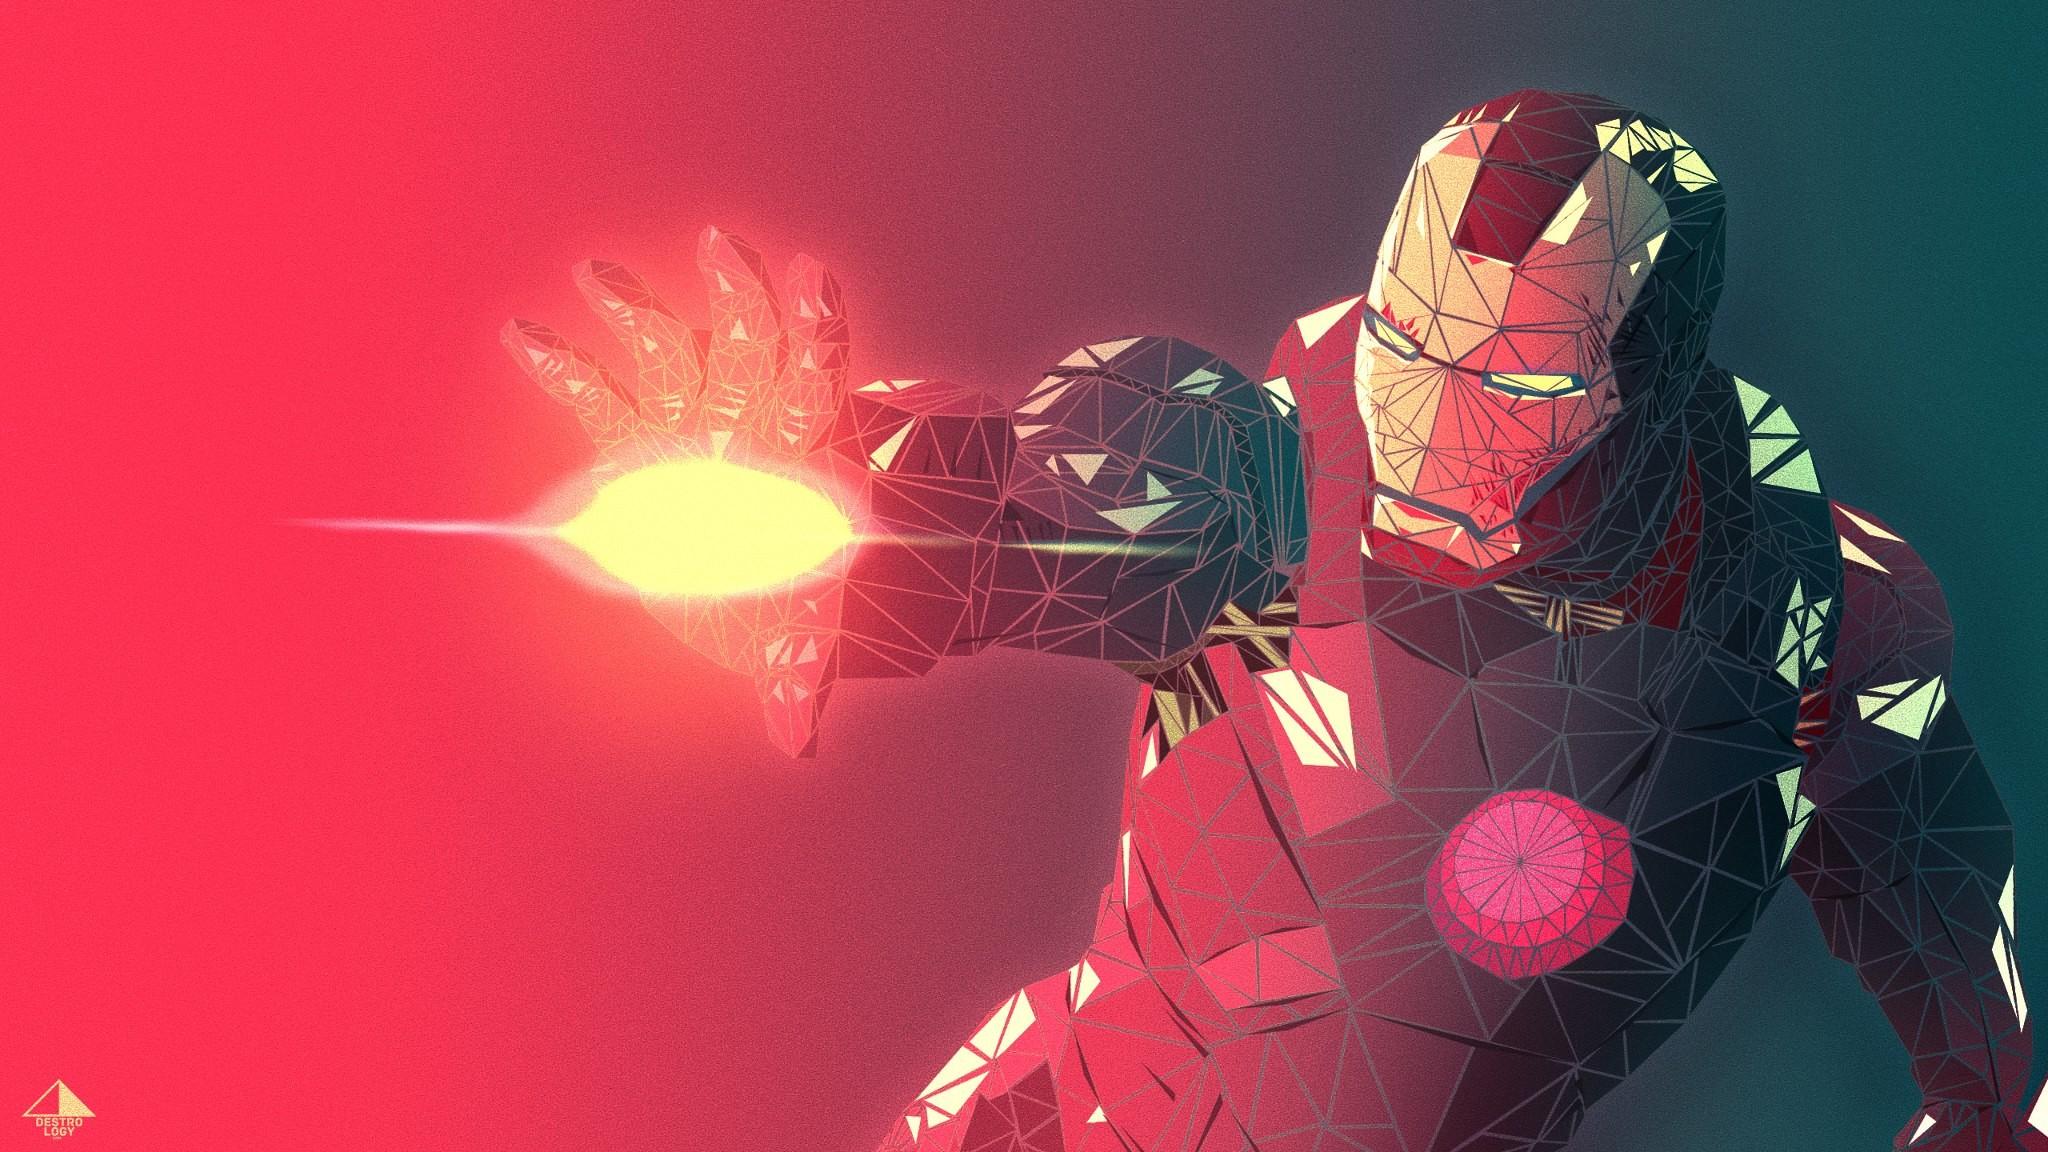 Iron Man triangles wallpaper, Marvel comics, Ironman, wallpapers,  superheroes, digital design